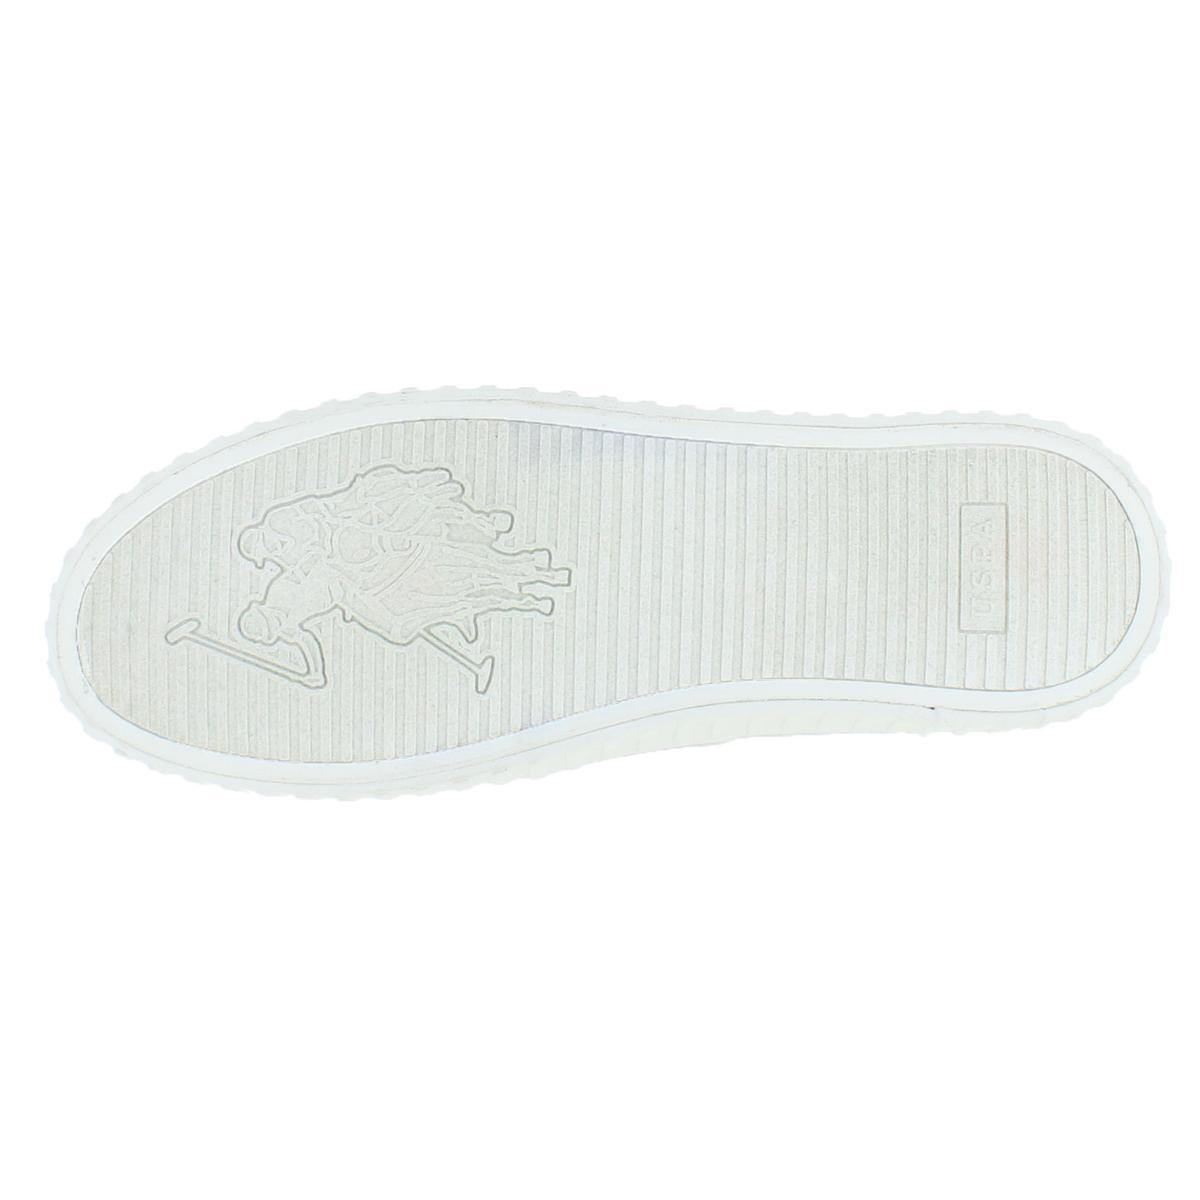 Zeto Men/'s Faux Leather Slip On Fashion Sneaker Shoes Polo Assn U.S